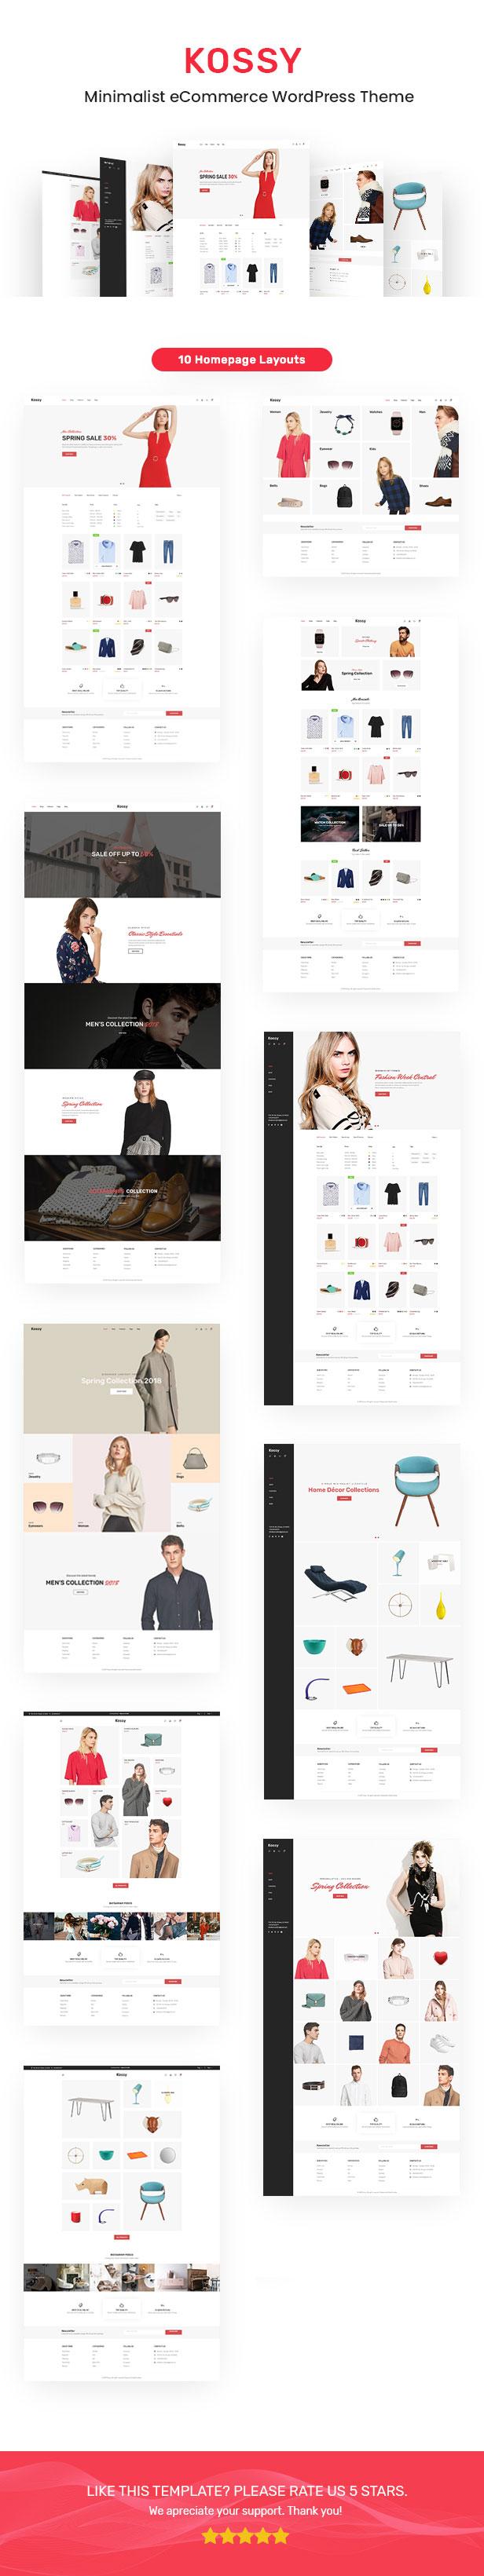 Kossy - Minimalist eCommerce WordPress Theme - 1